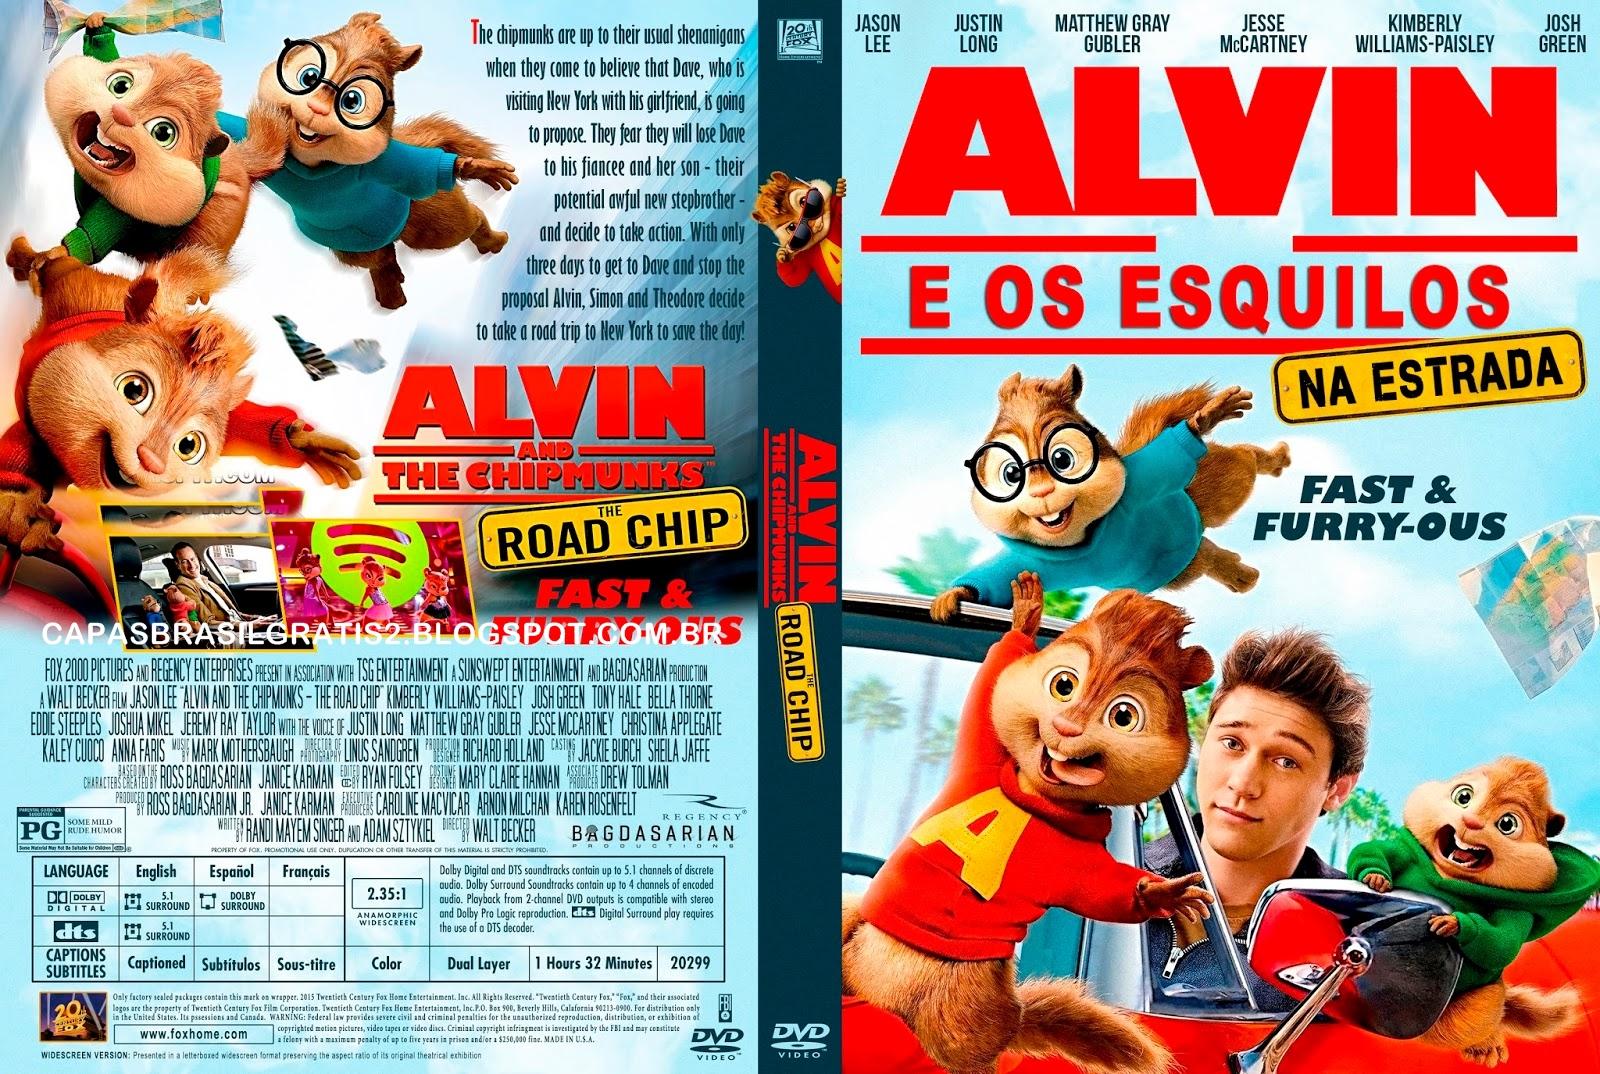 Alvin e os Esquilos Na Estrada DVD-R Alvin E Os Esquilos Na Estrada 2016